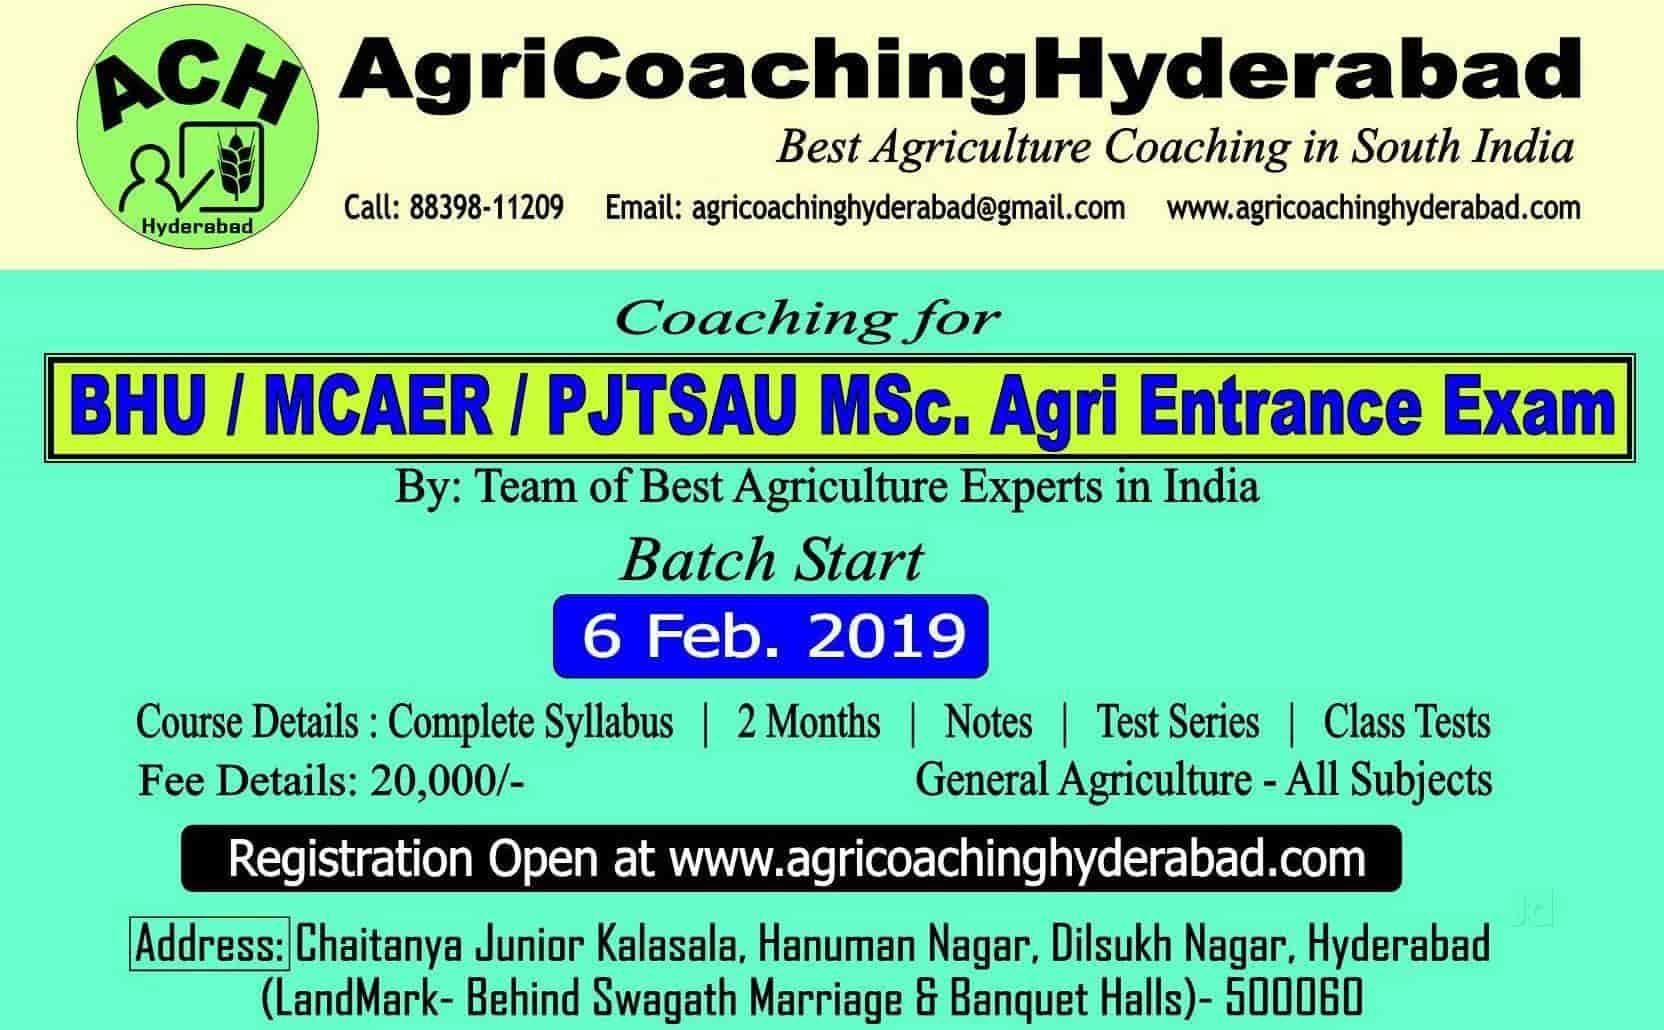 Agri Coaching Hyderabad, Dilsukhnagar - Agricultural